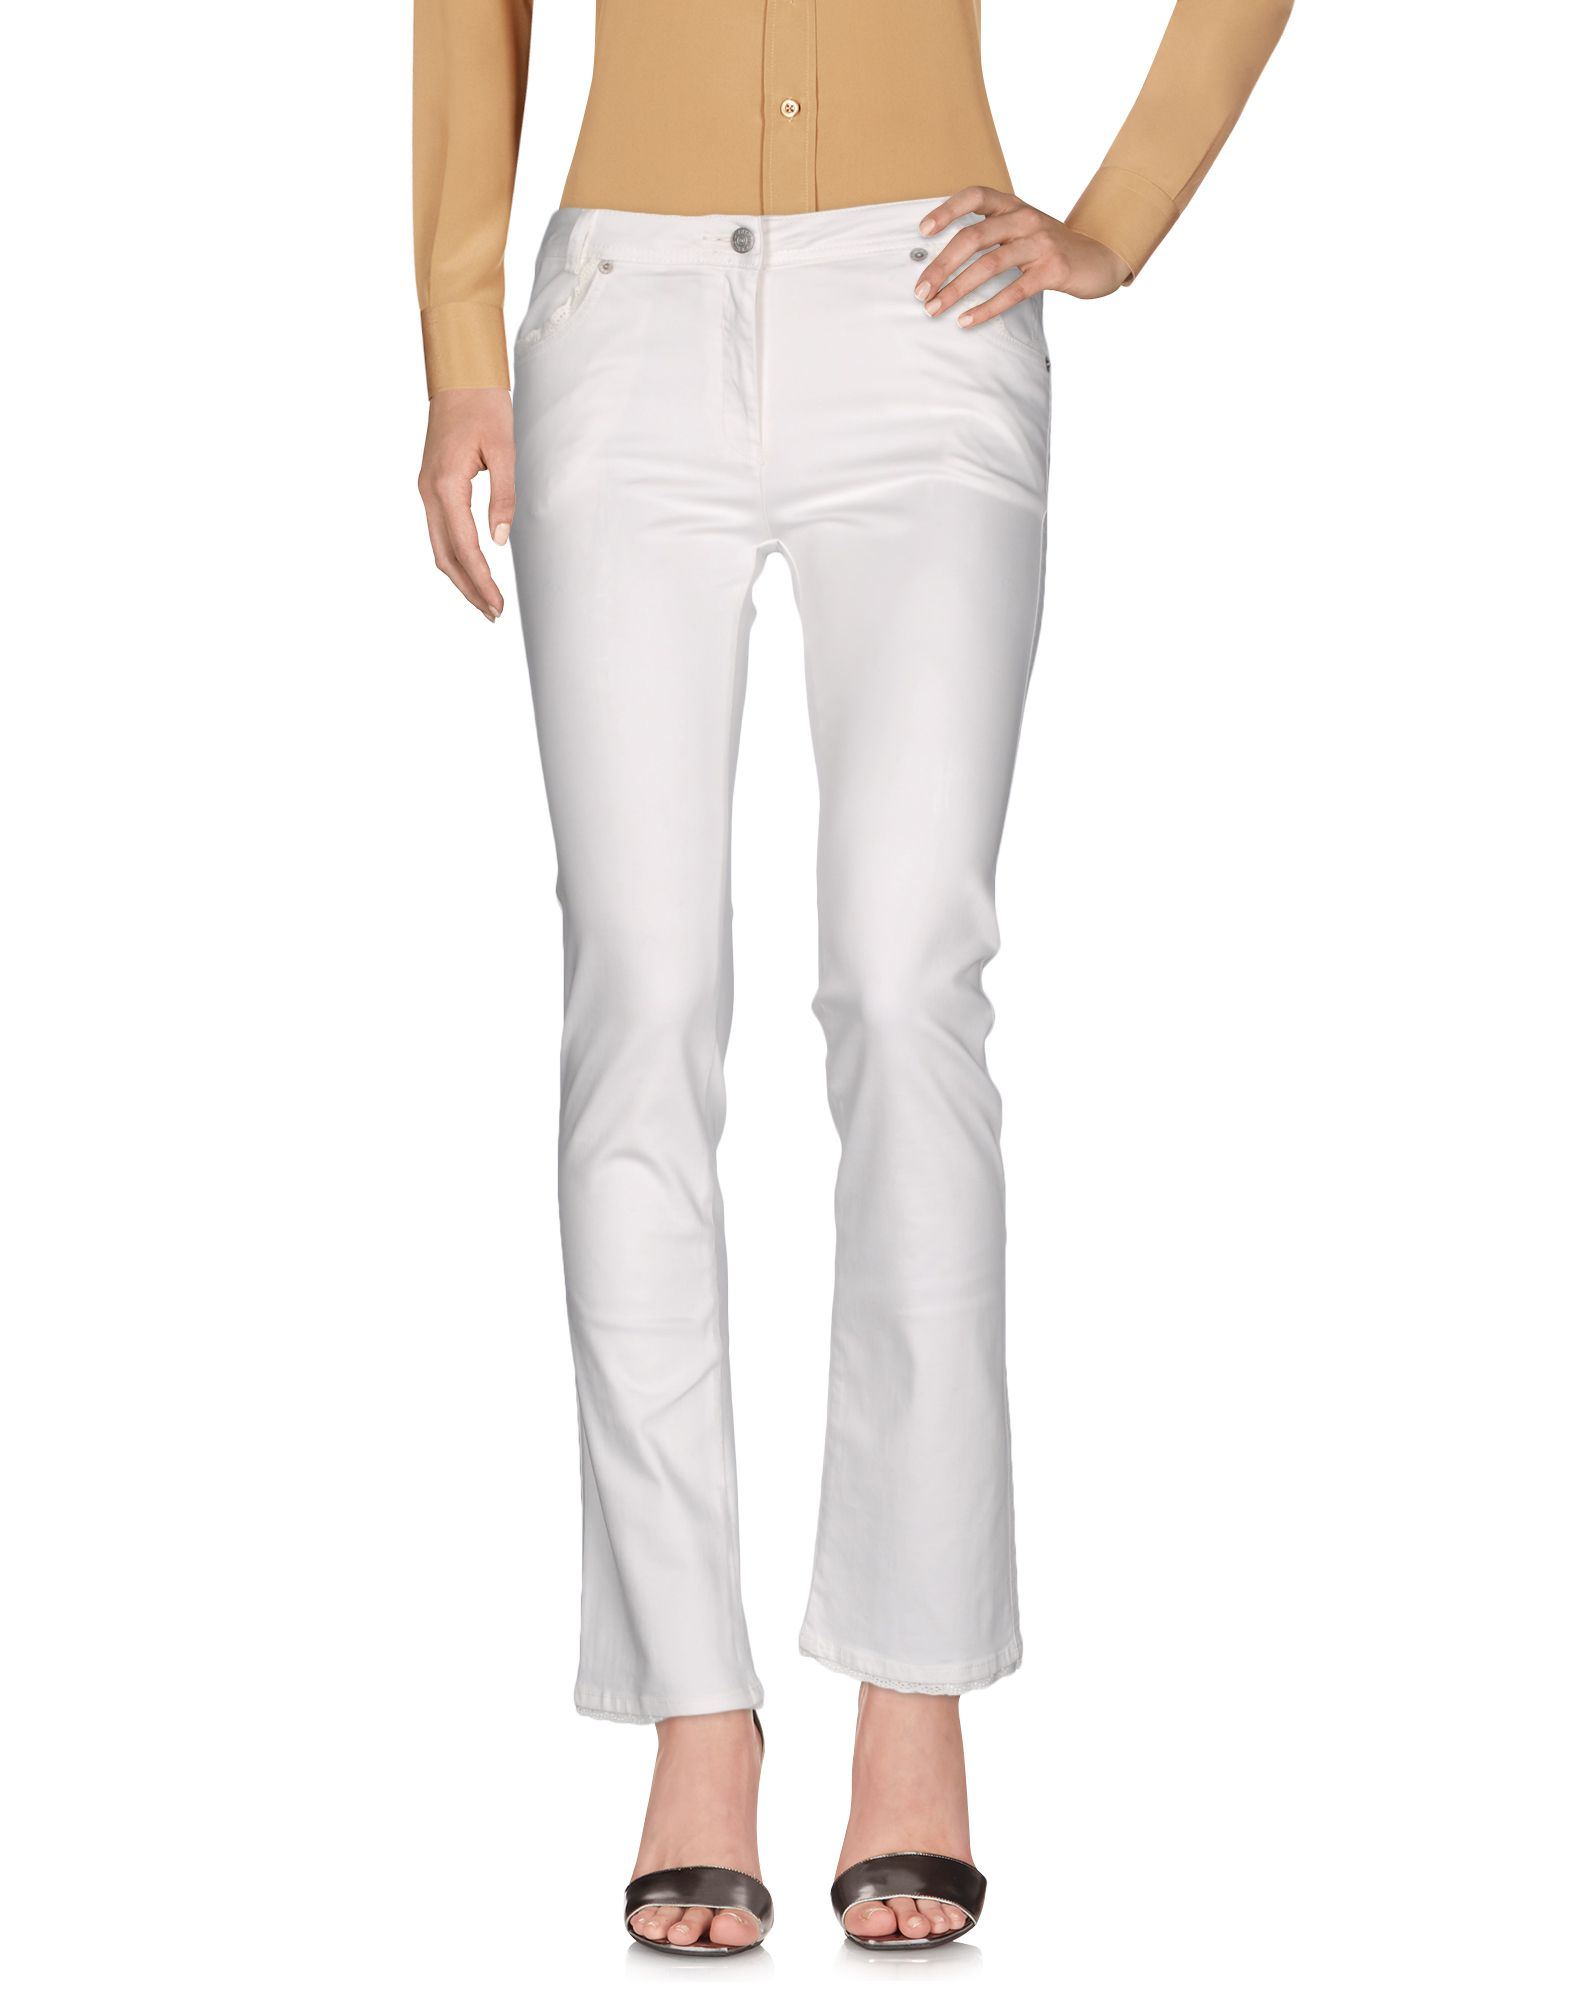 Pantalone Tricot Chic Donna - Acquista online su YRsYz2ZF1K